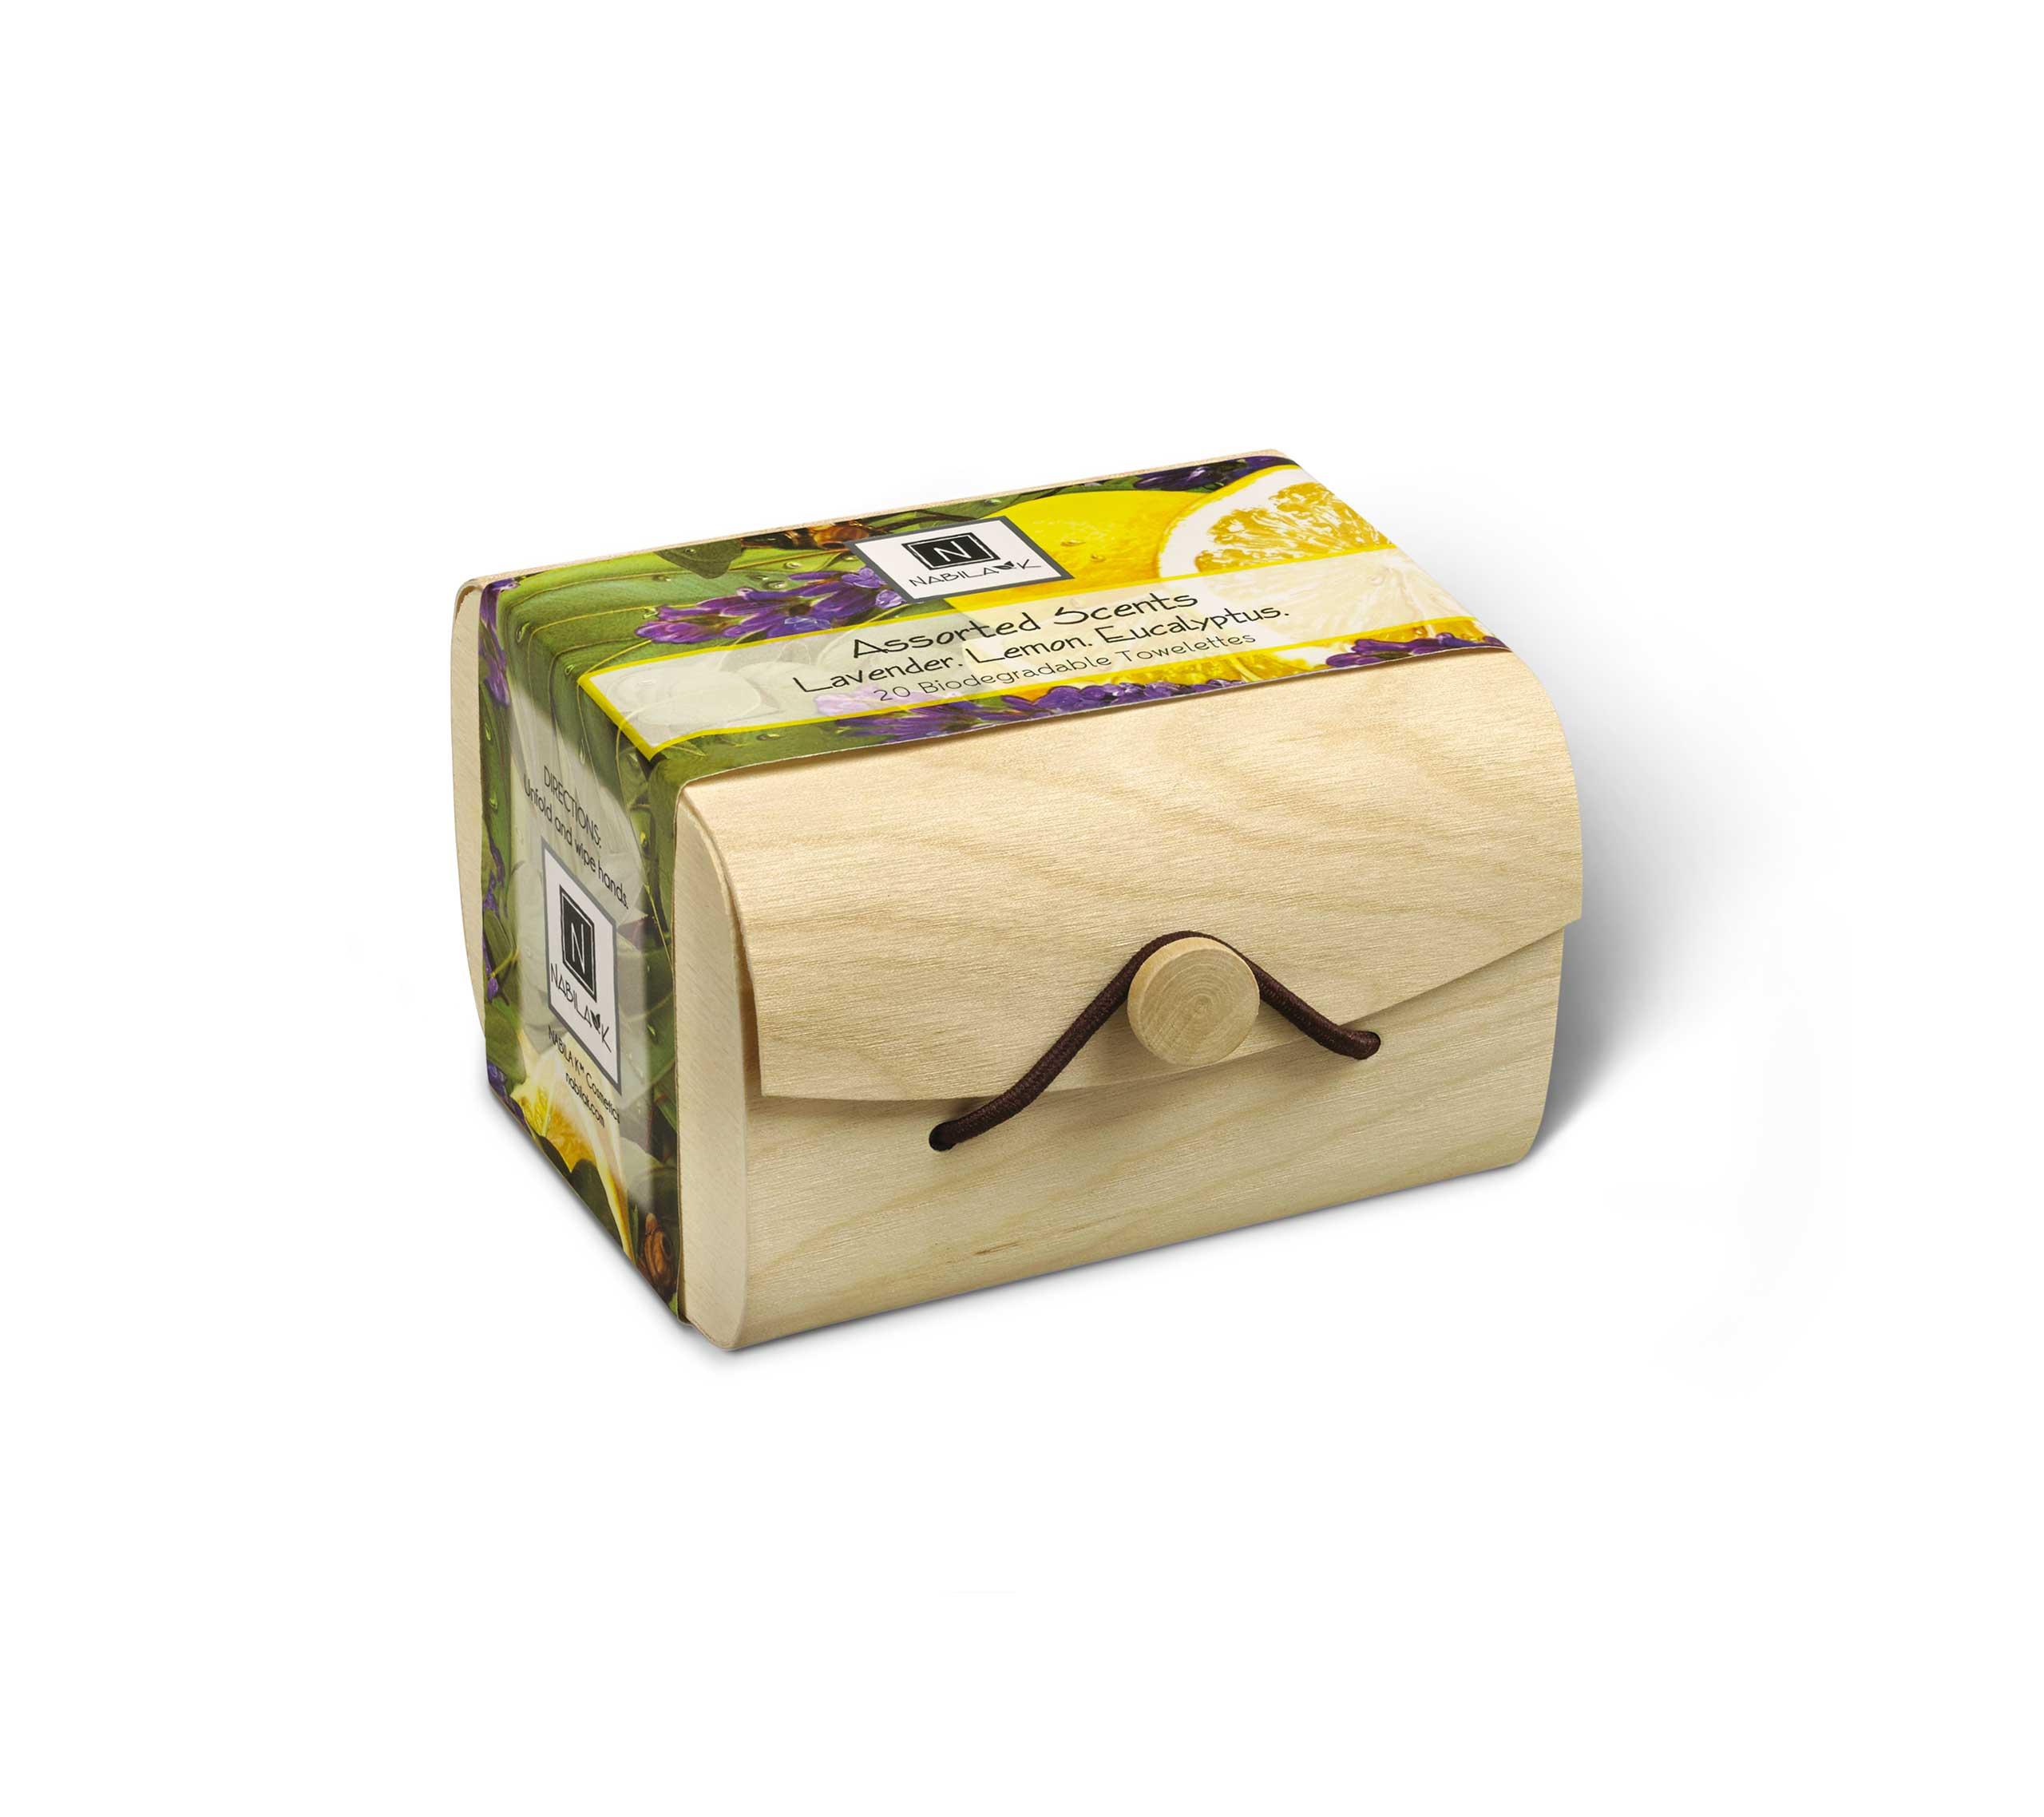 Assorted Box of 20 Lavender, Lemon, and Eucalyptus Biodegradable Towelettes